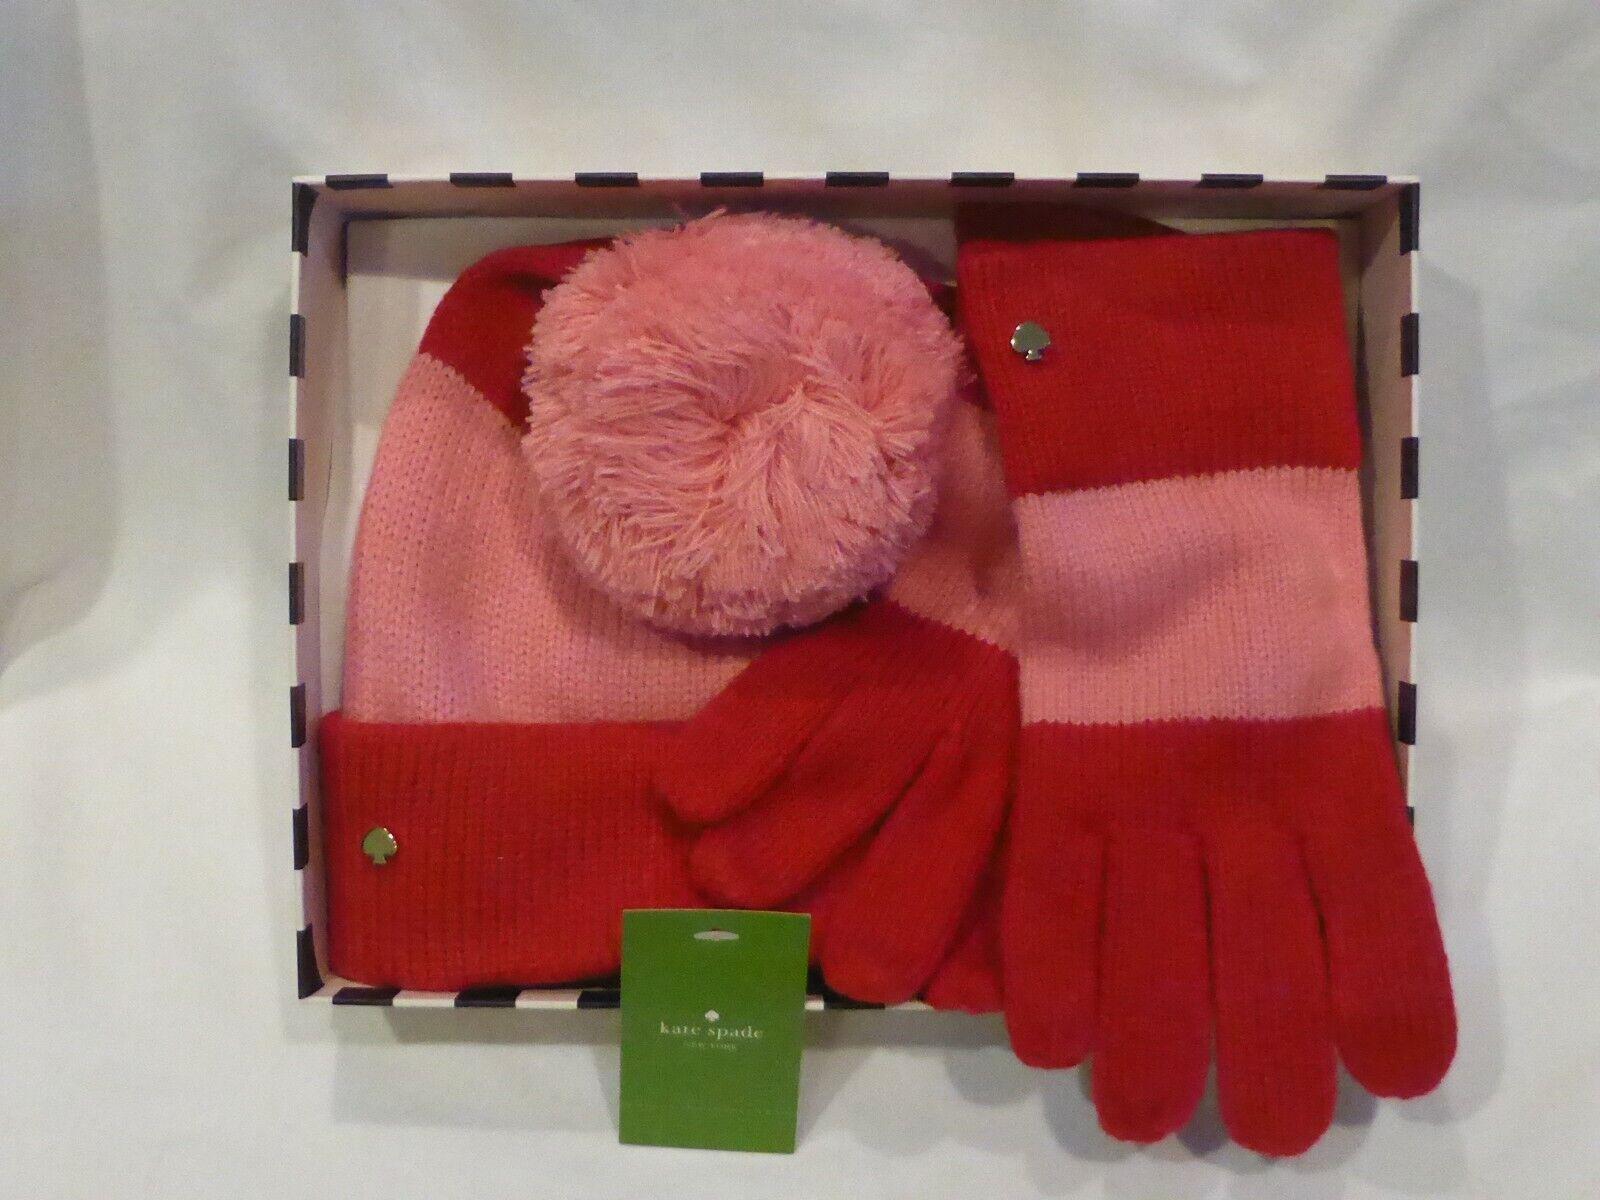 Kate Spade Beanie Pom Hat & Glove Colorblock Red & Pink Stripe Set NIB